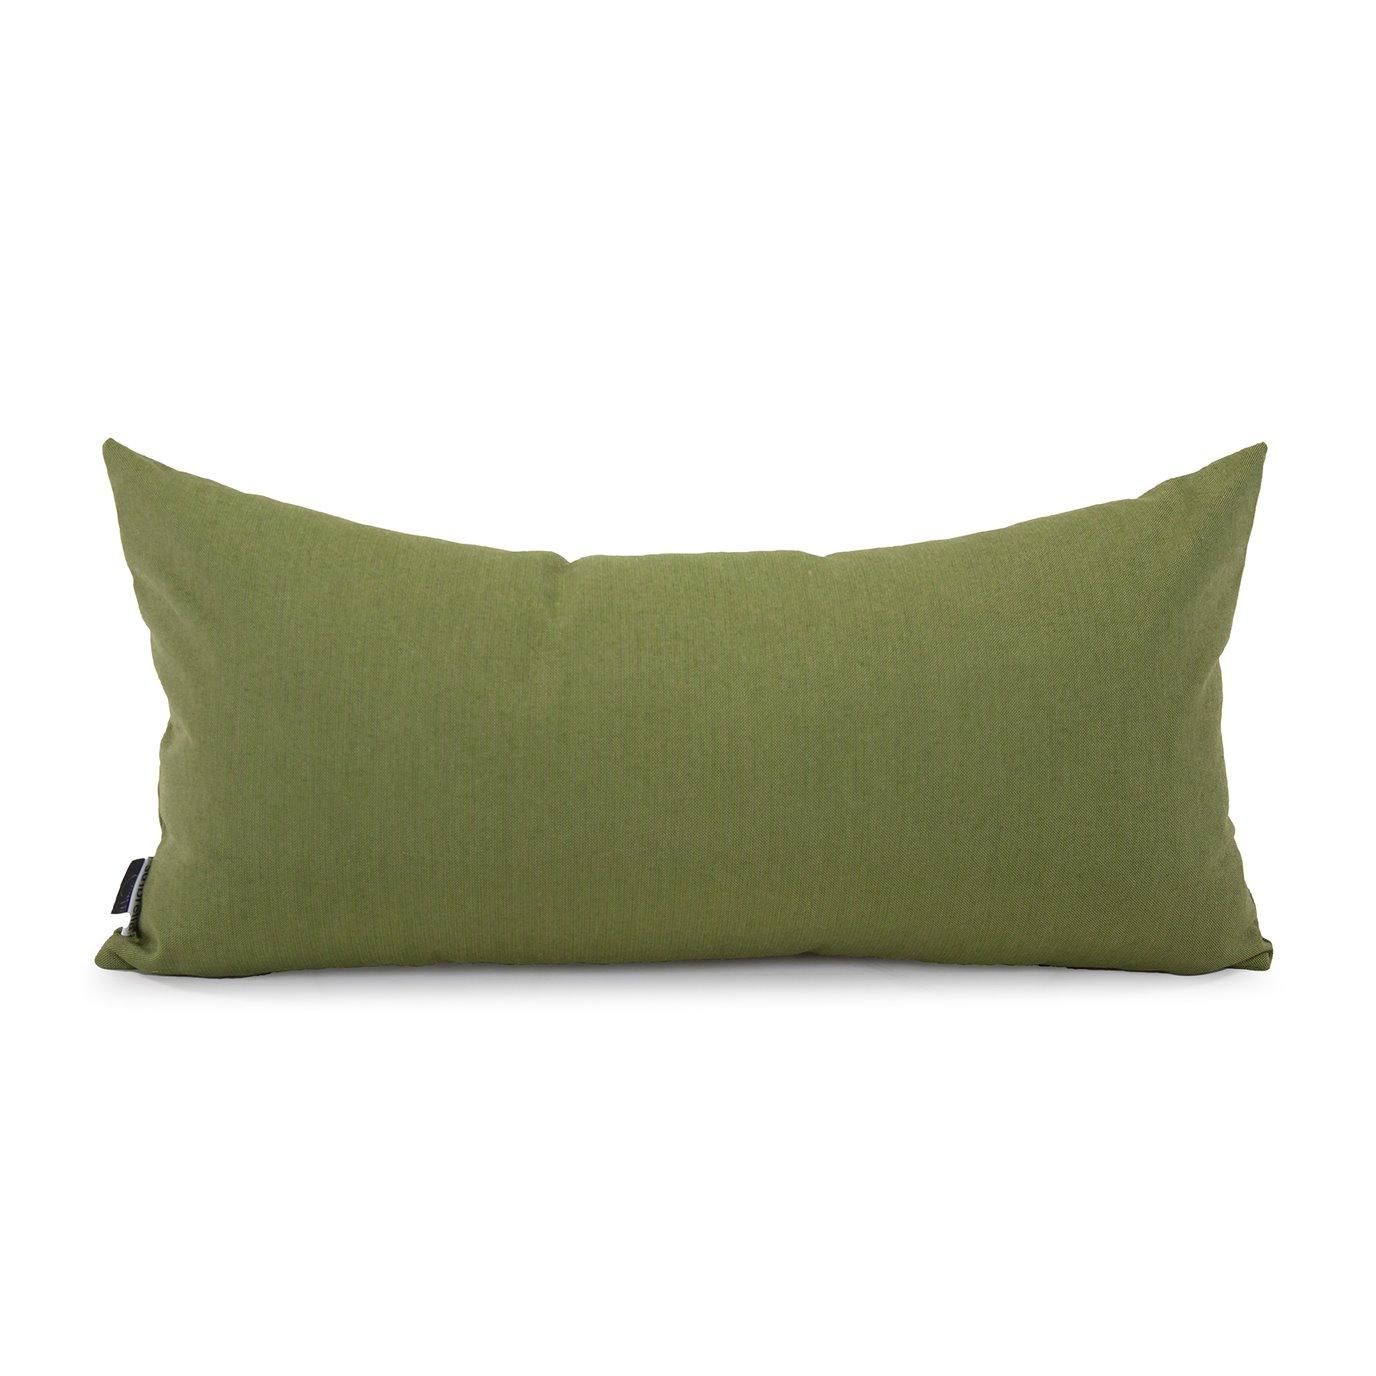 Howard Elliott Kidney Pillow Outdoor Sunbrella Seascape Moss